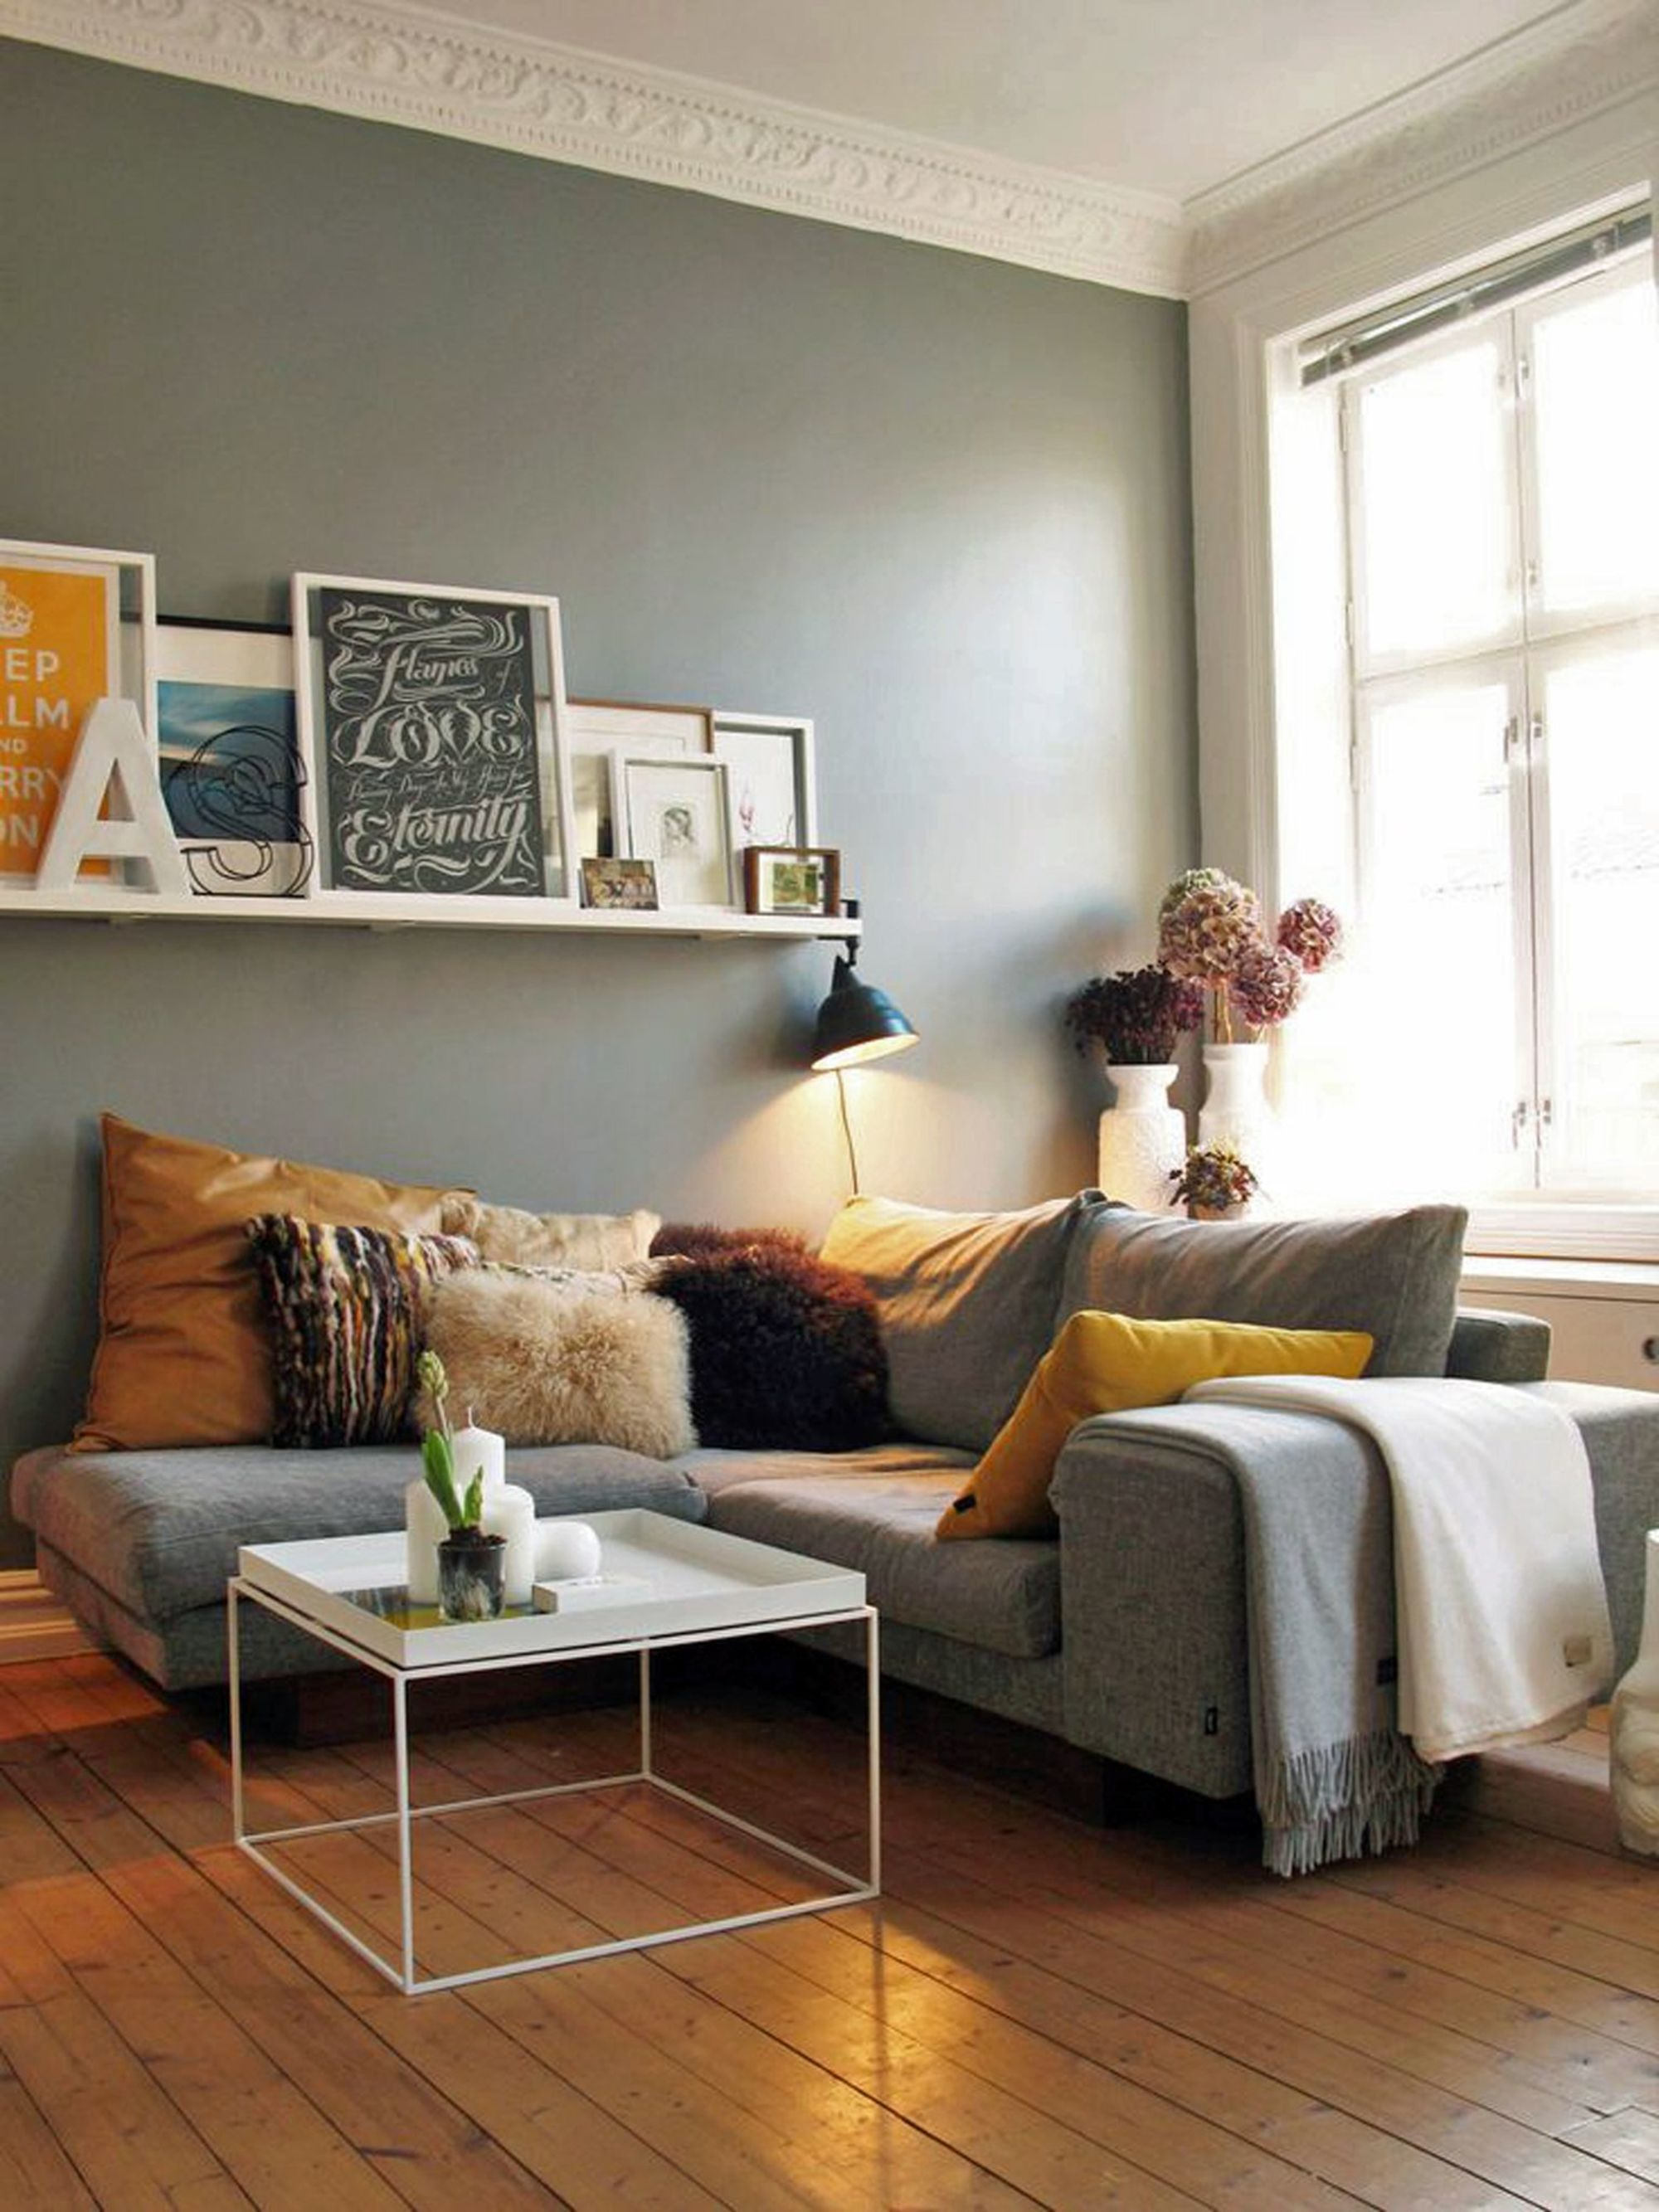 deco petit salon moderne amazing home ideas. Black Bedroom Furniture Sets. Home Design Ideas